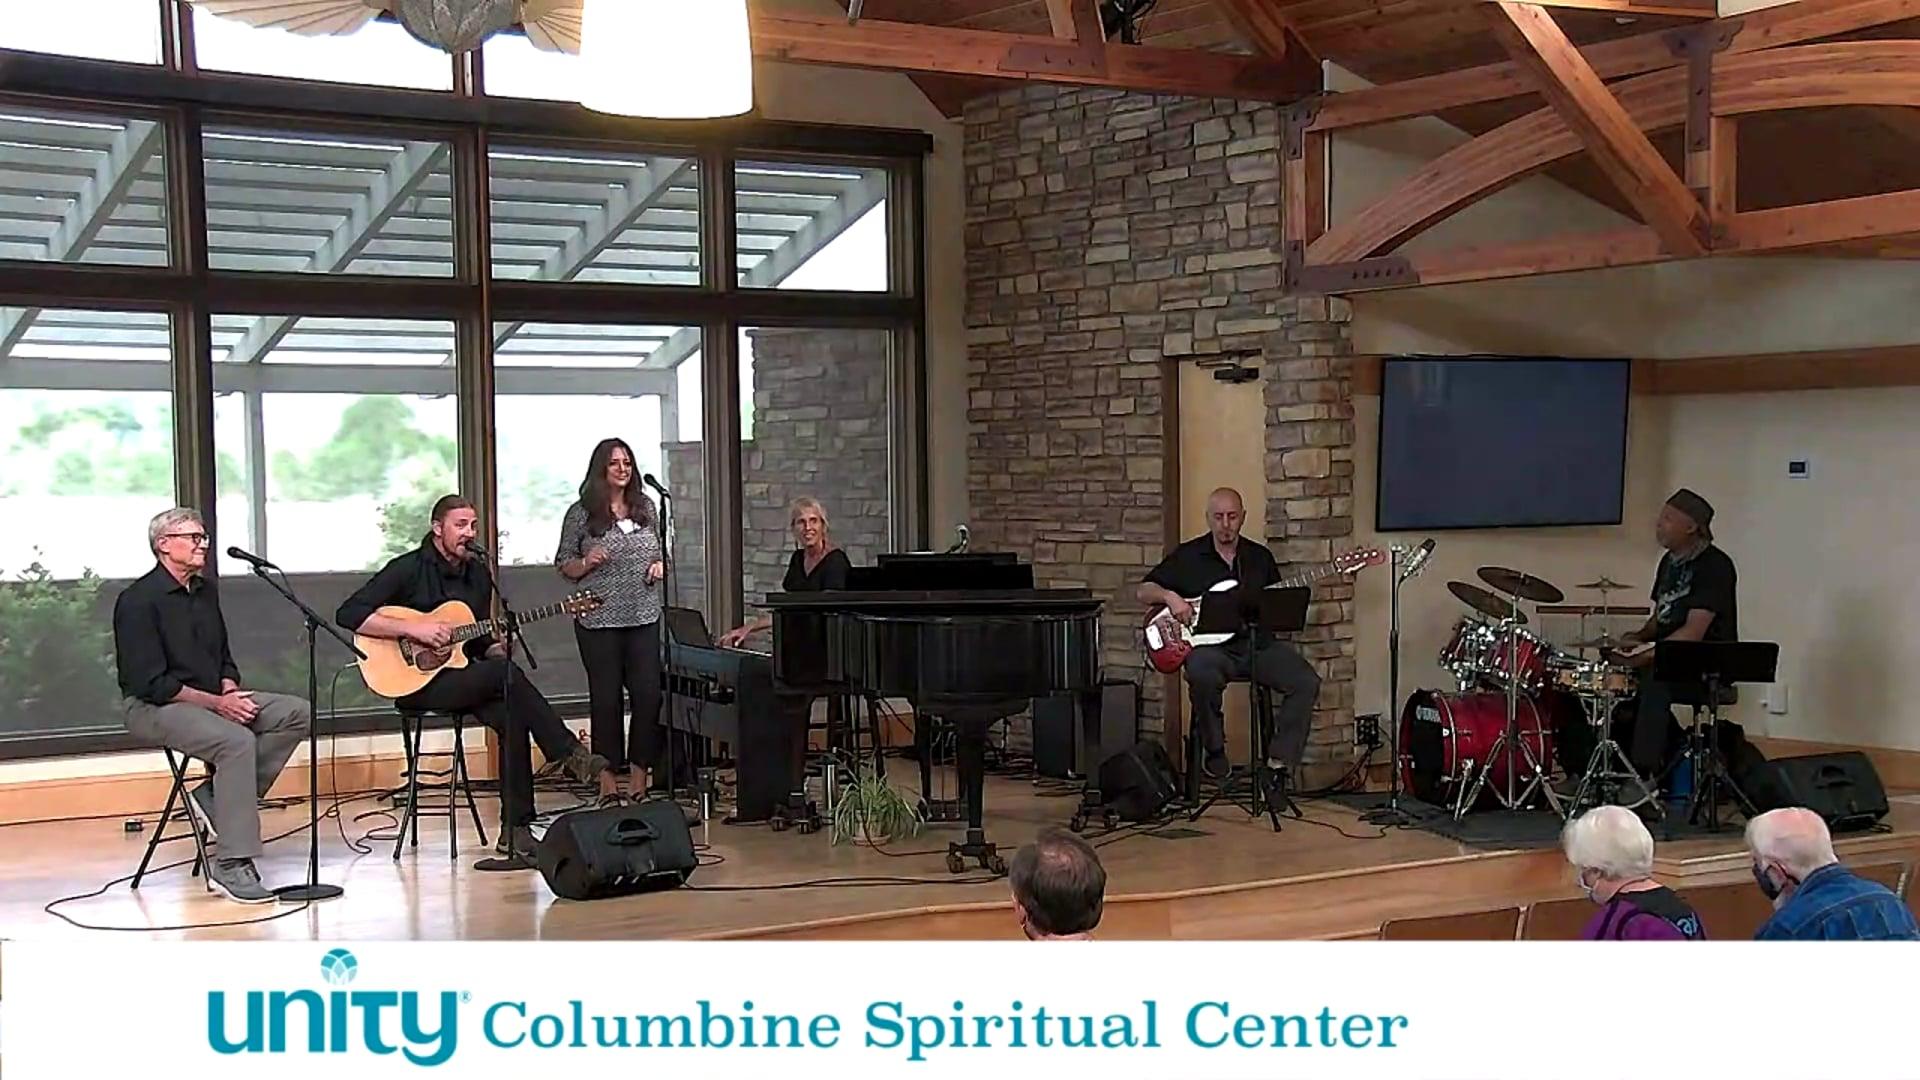 Columbine Unity Spiritual Center Sunday Service 10am Mountain